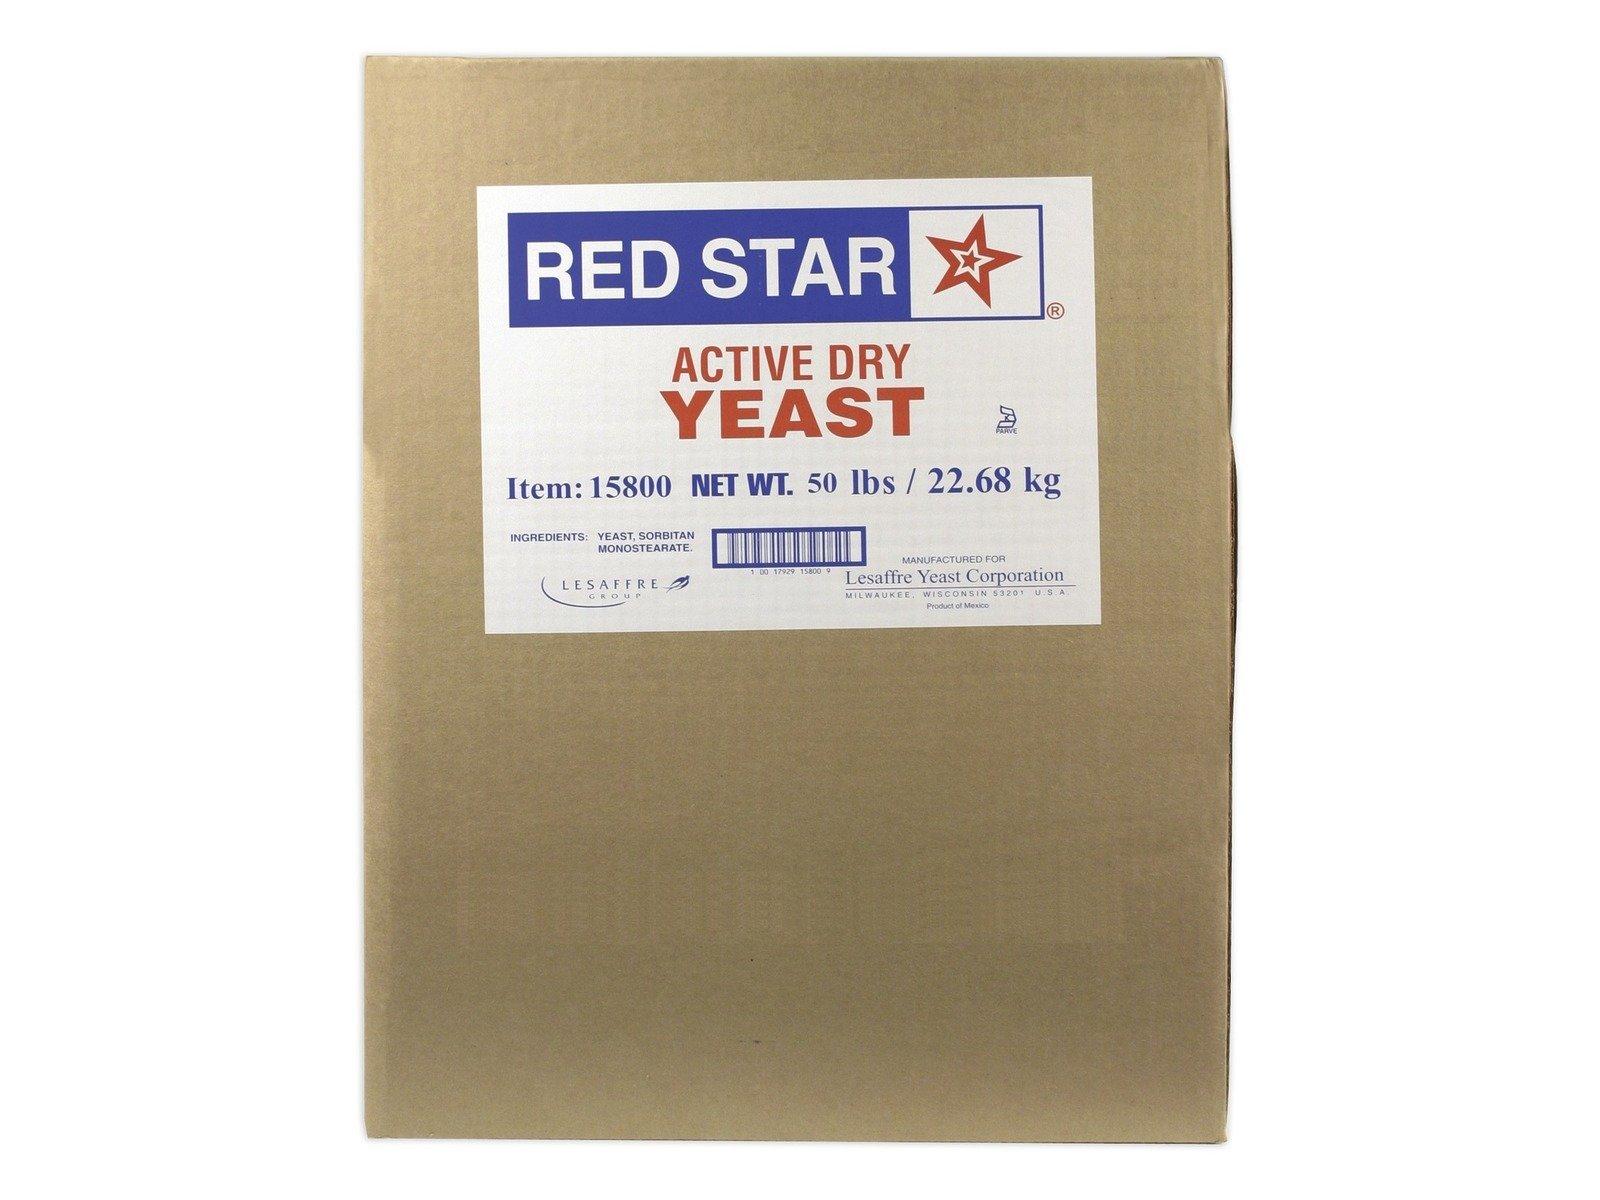 RED STAR YEAST FLAKE NUTRTNL, 50 LB